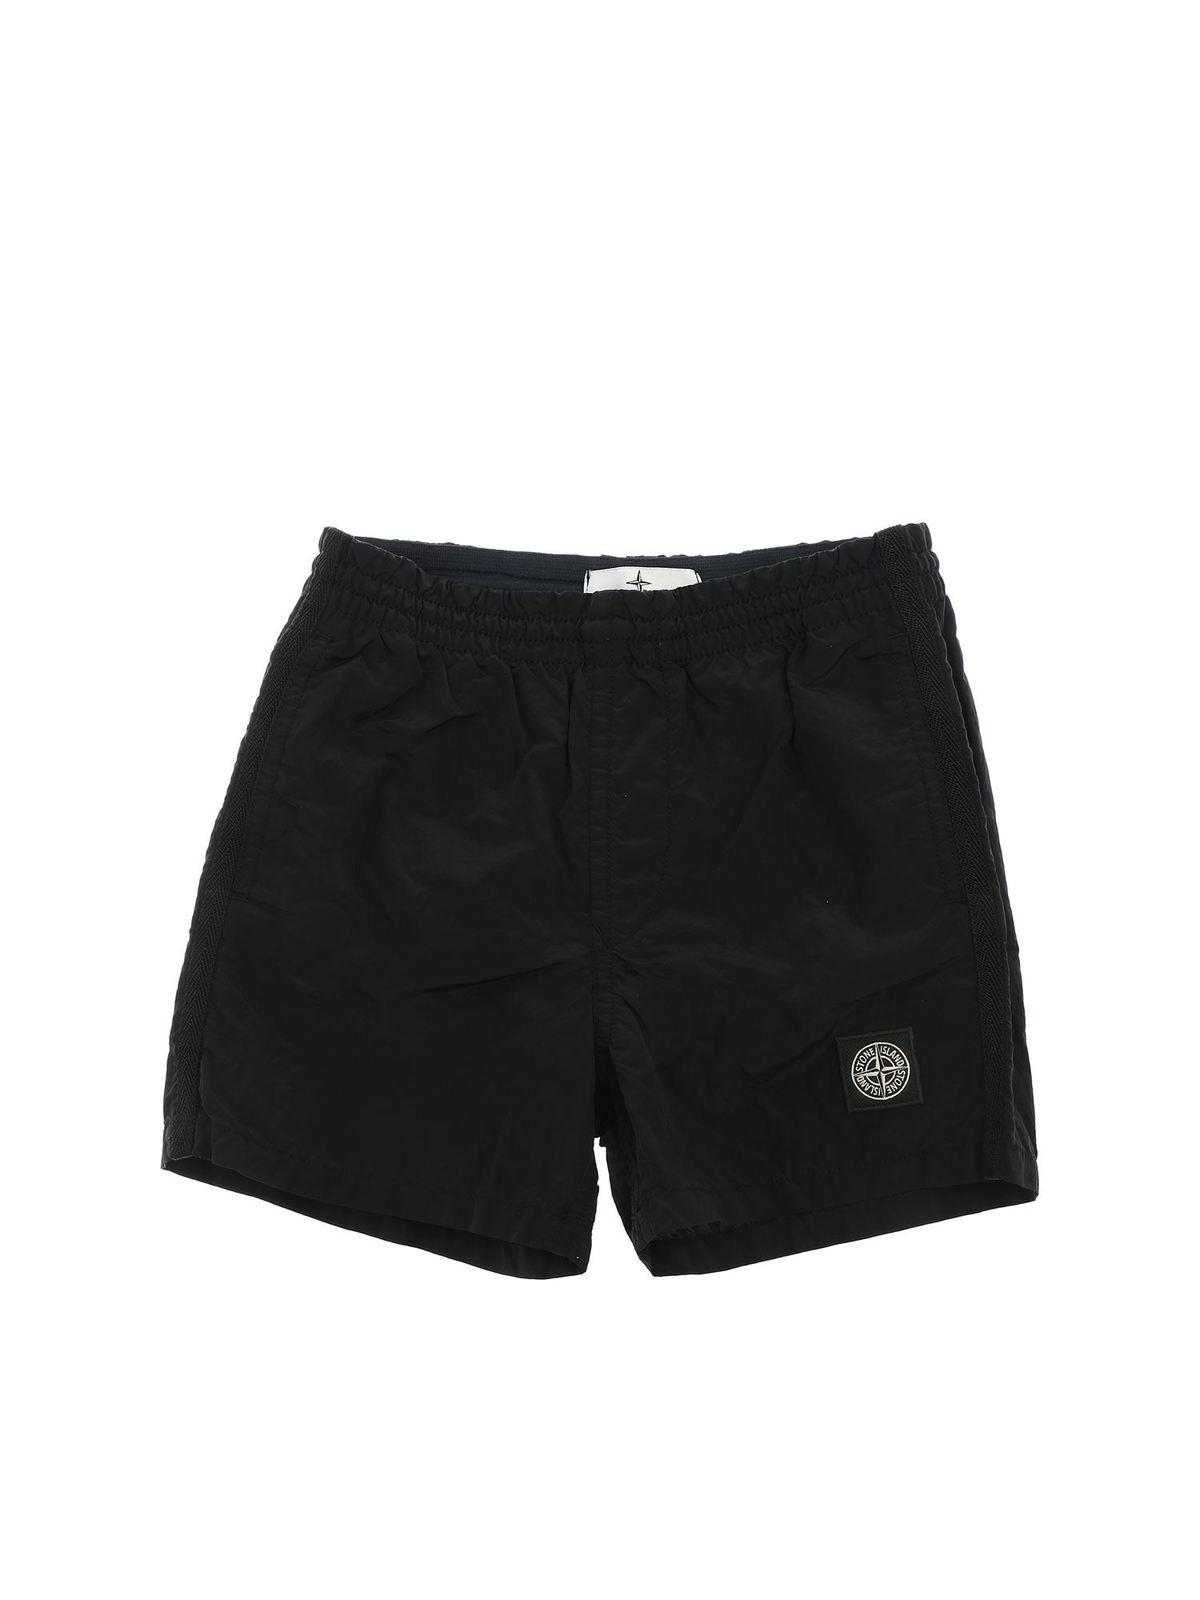 Stone Island Junior Linings LOGO SWIM SHORTS IN BLACK